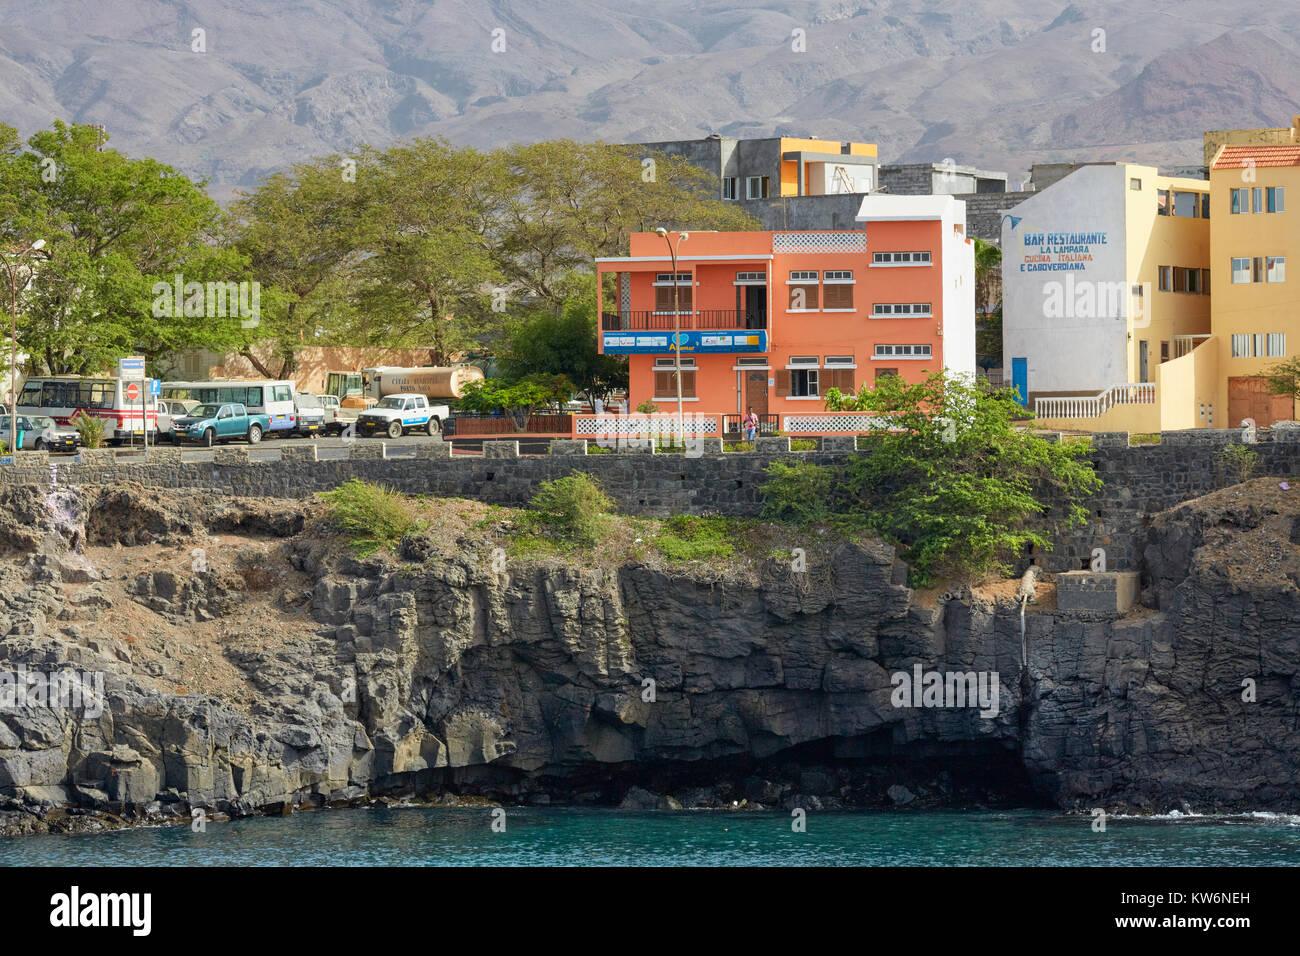 Porto Novo, Santo Antao, Cape Verde (Cabo Verde) - Stock Image